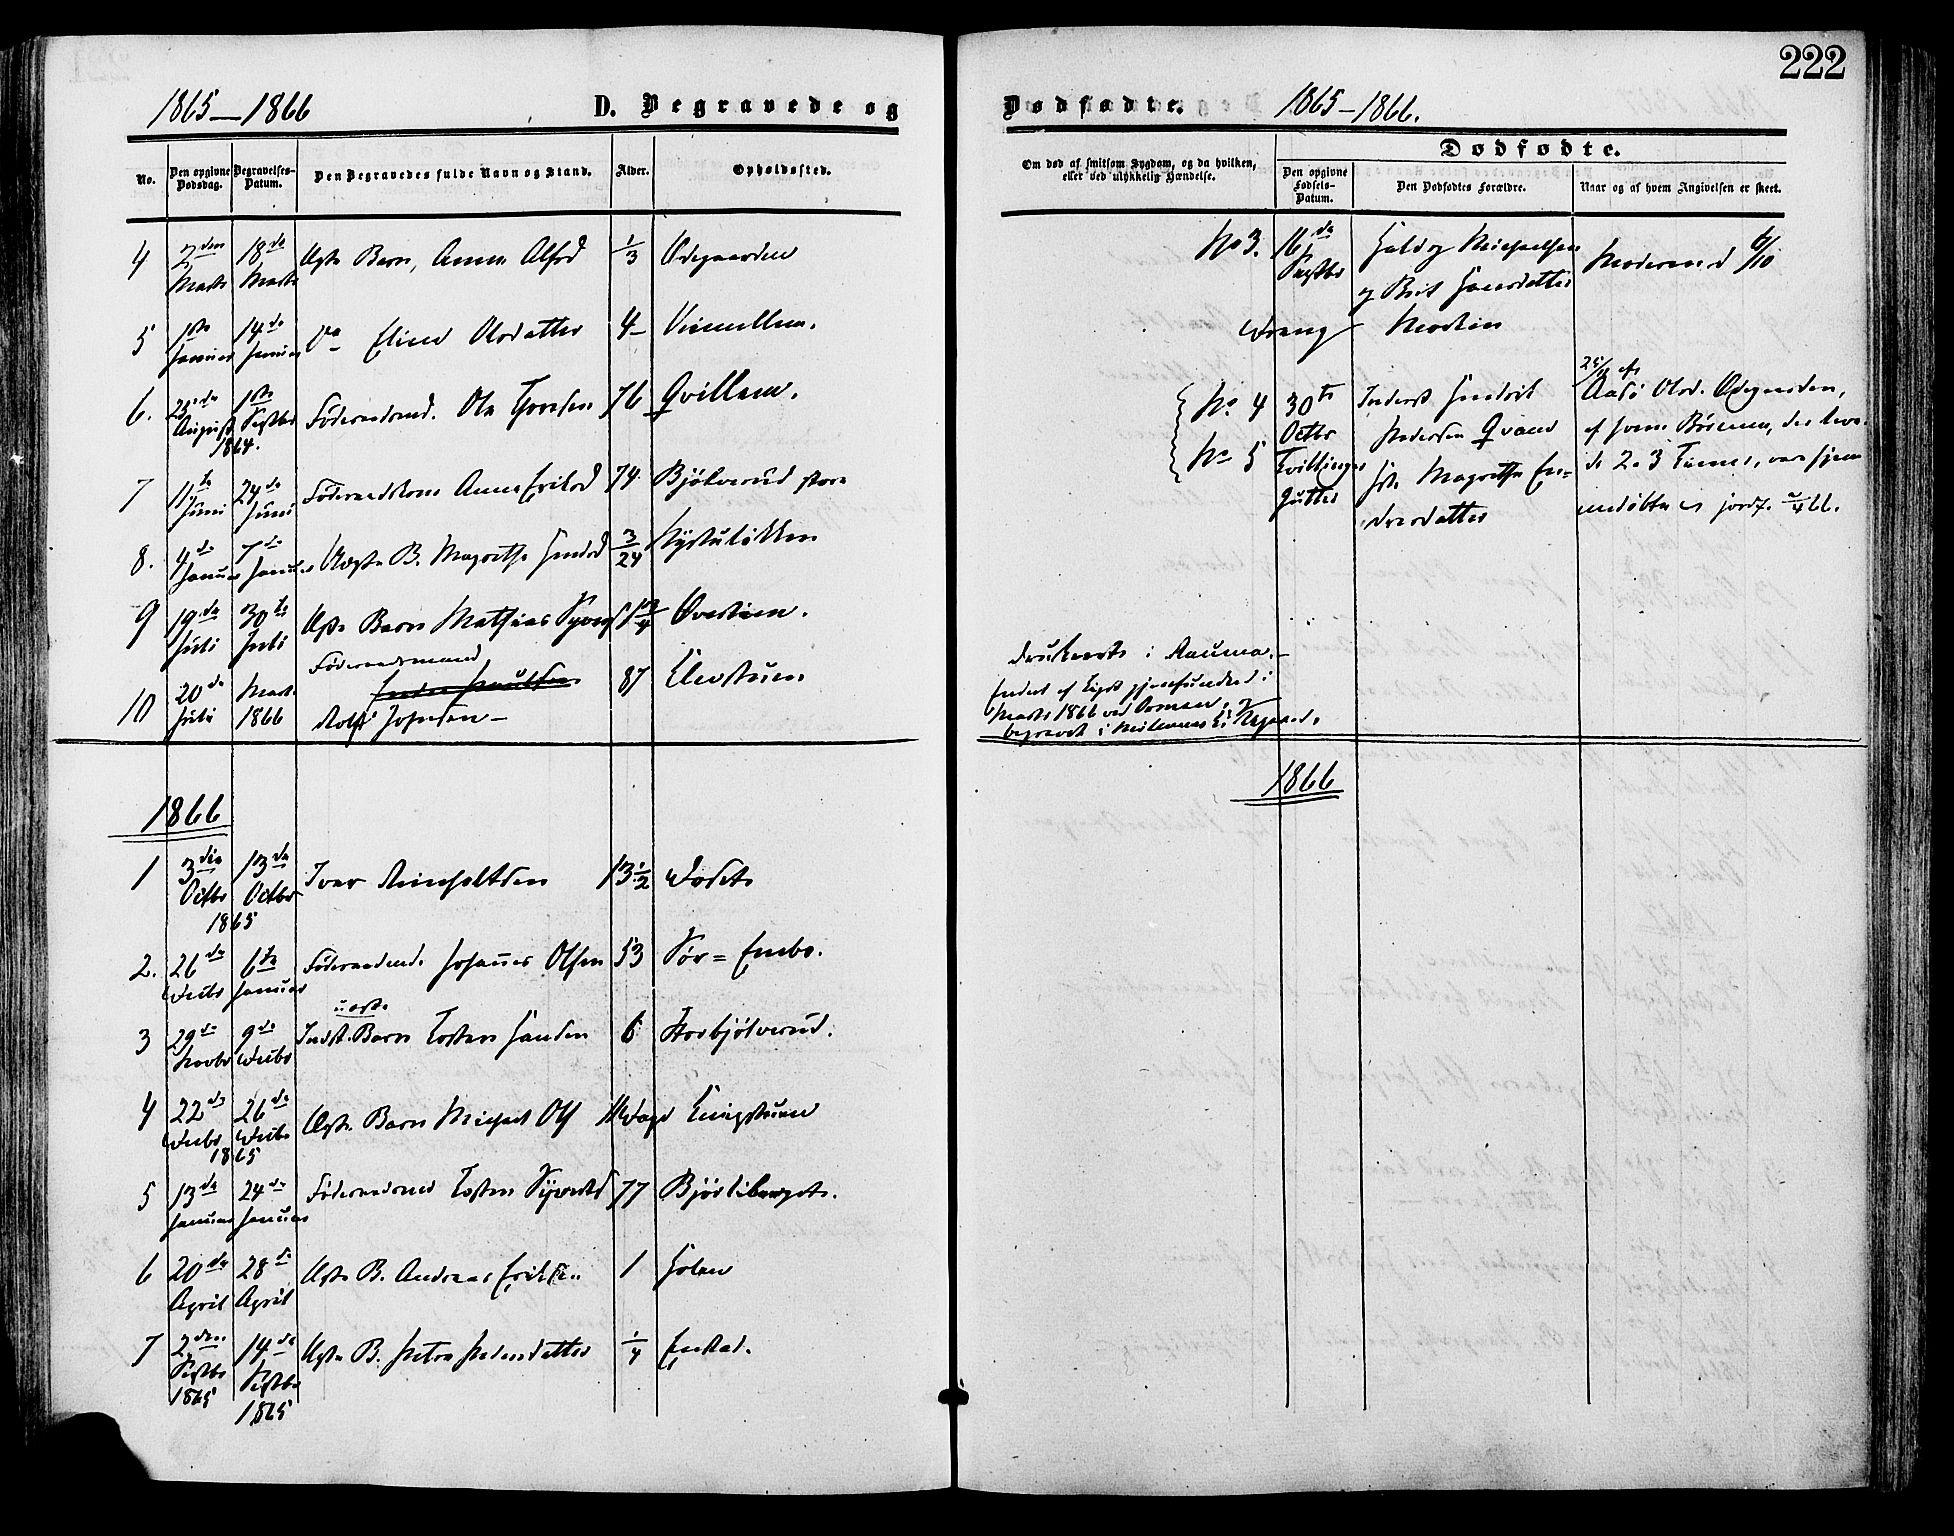 SAH, Lesja prestekontor, Ministerialbok nr. 9, 1854-1889, s. 222